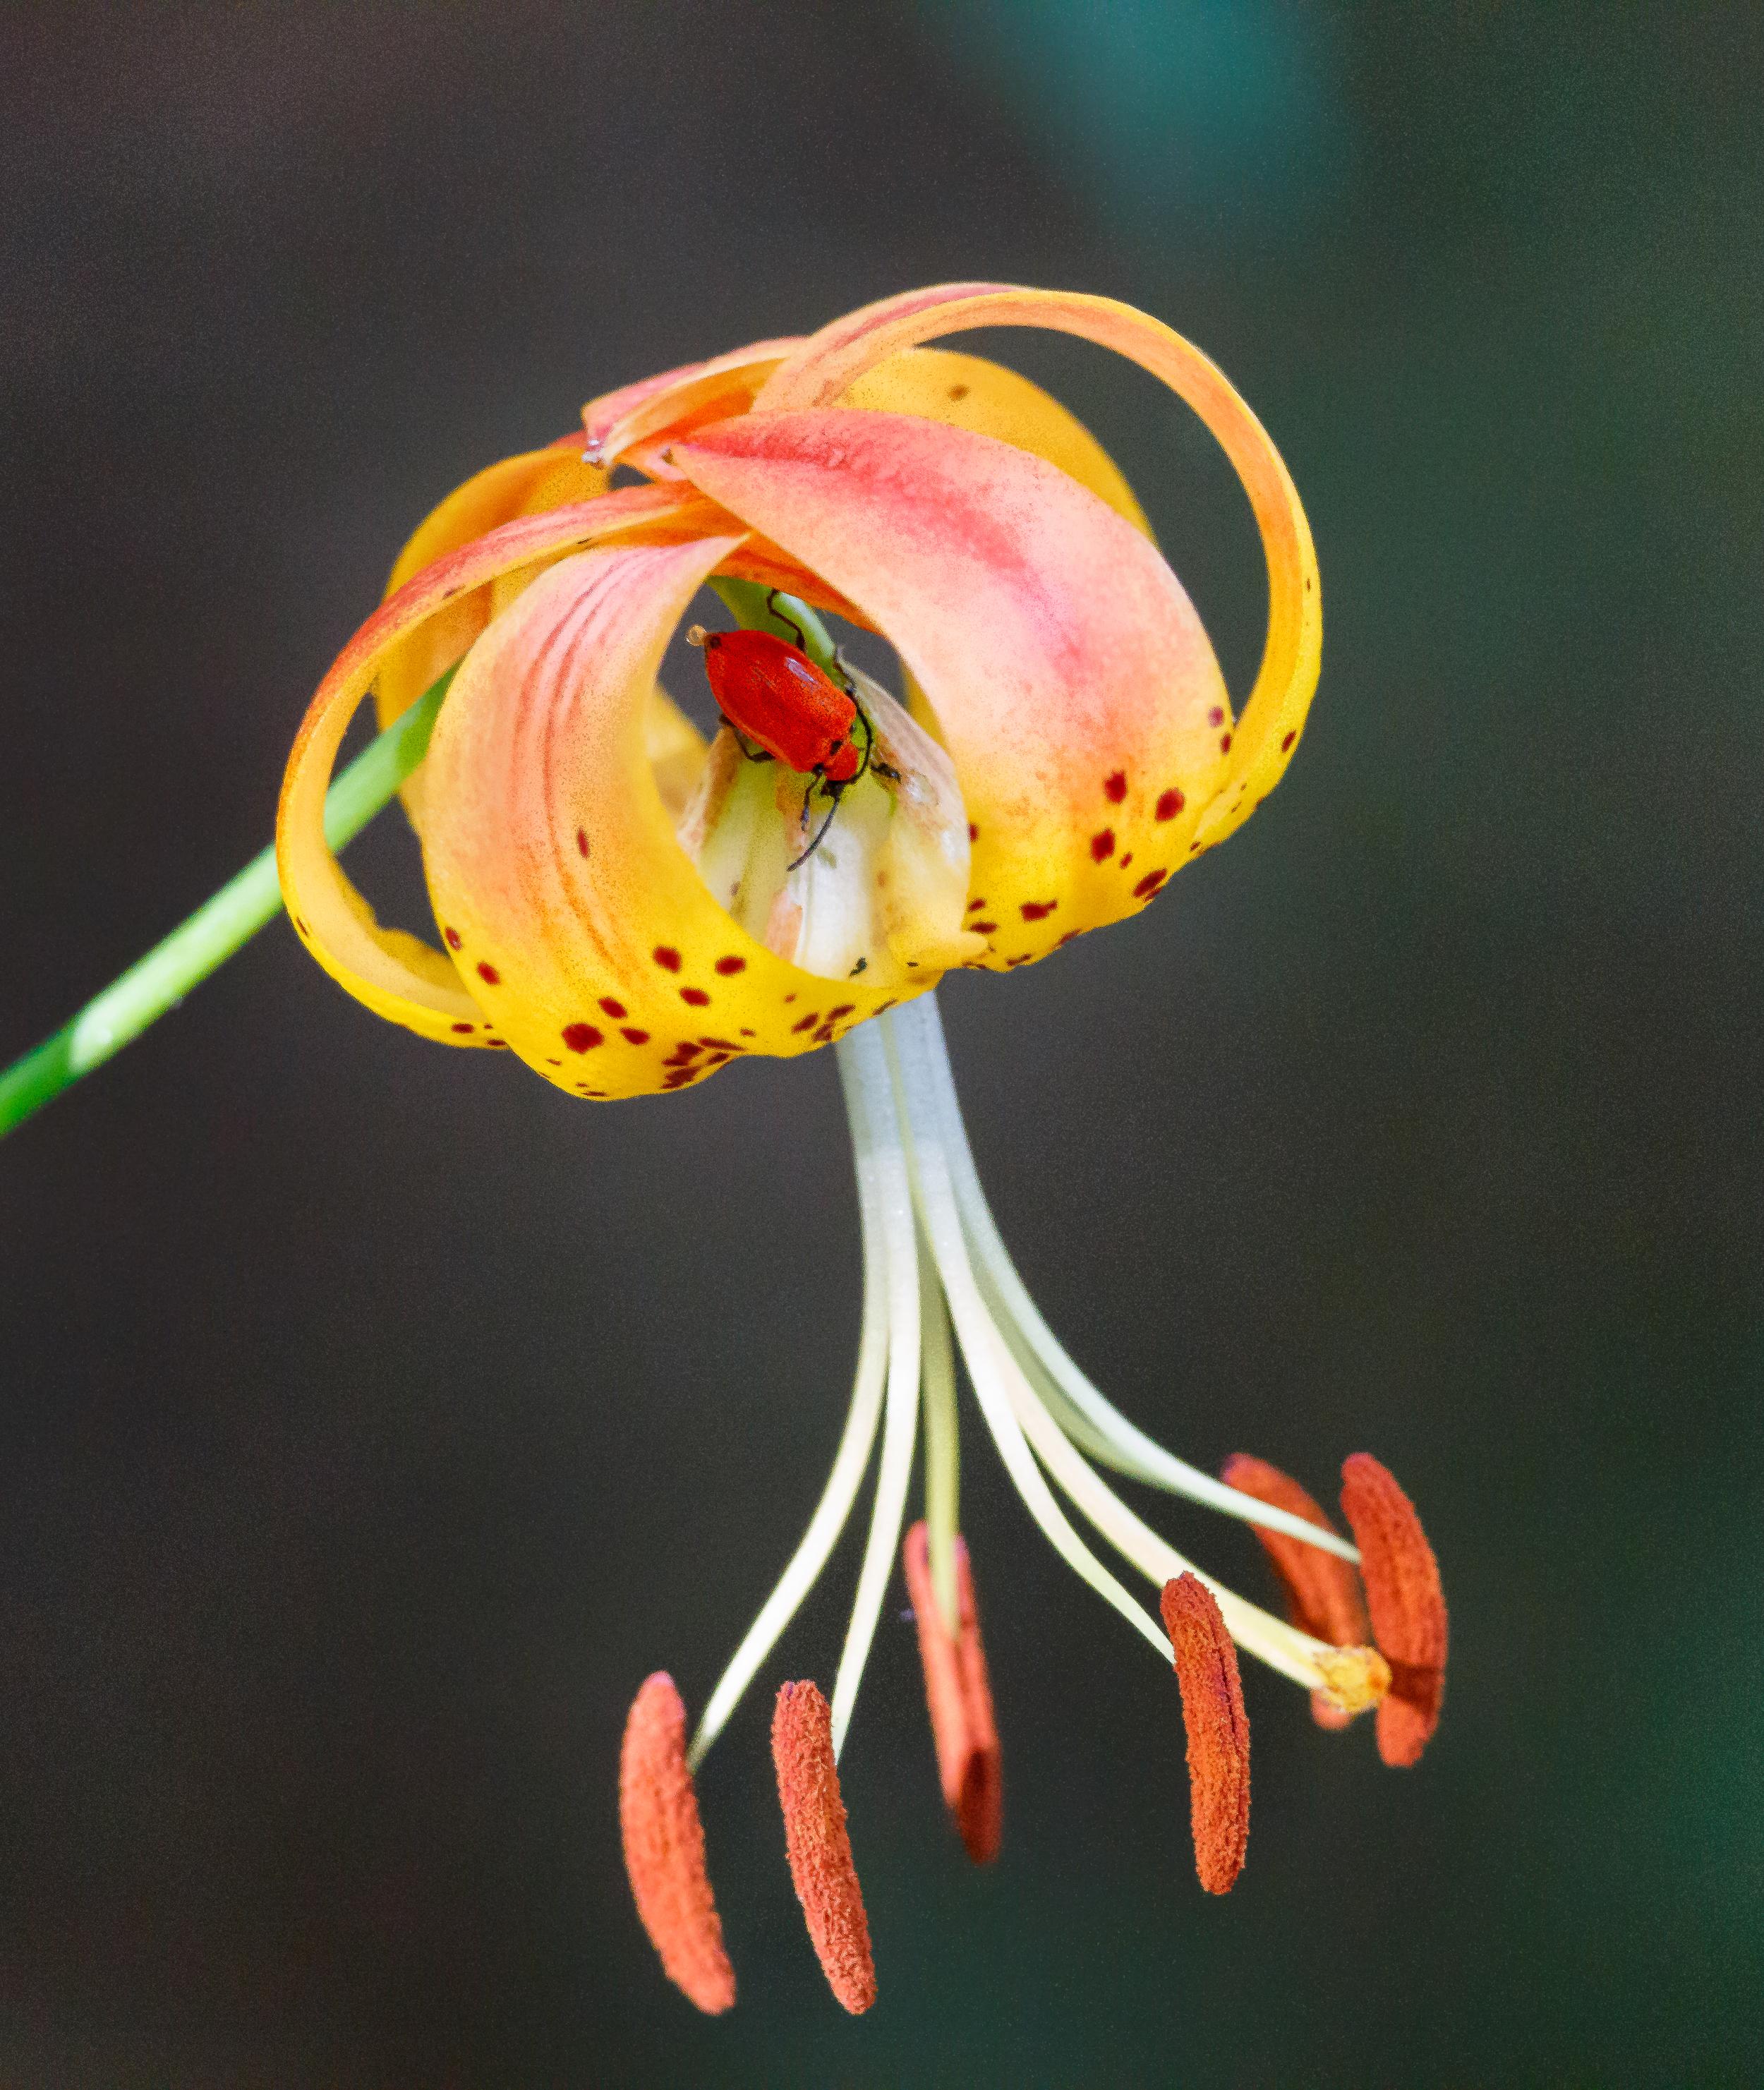 Tiger Lilly (  Lilium superbum ) and  lily leaf beetle  (   Lilioceris lilii   )